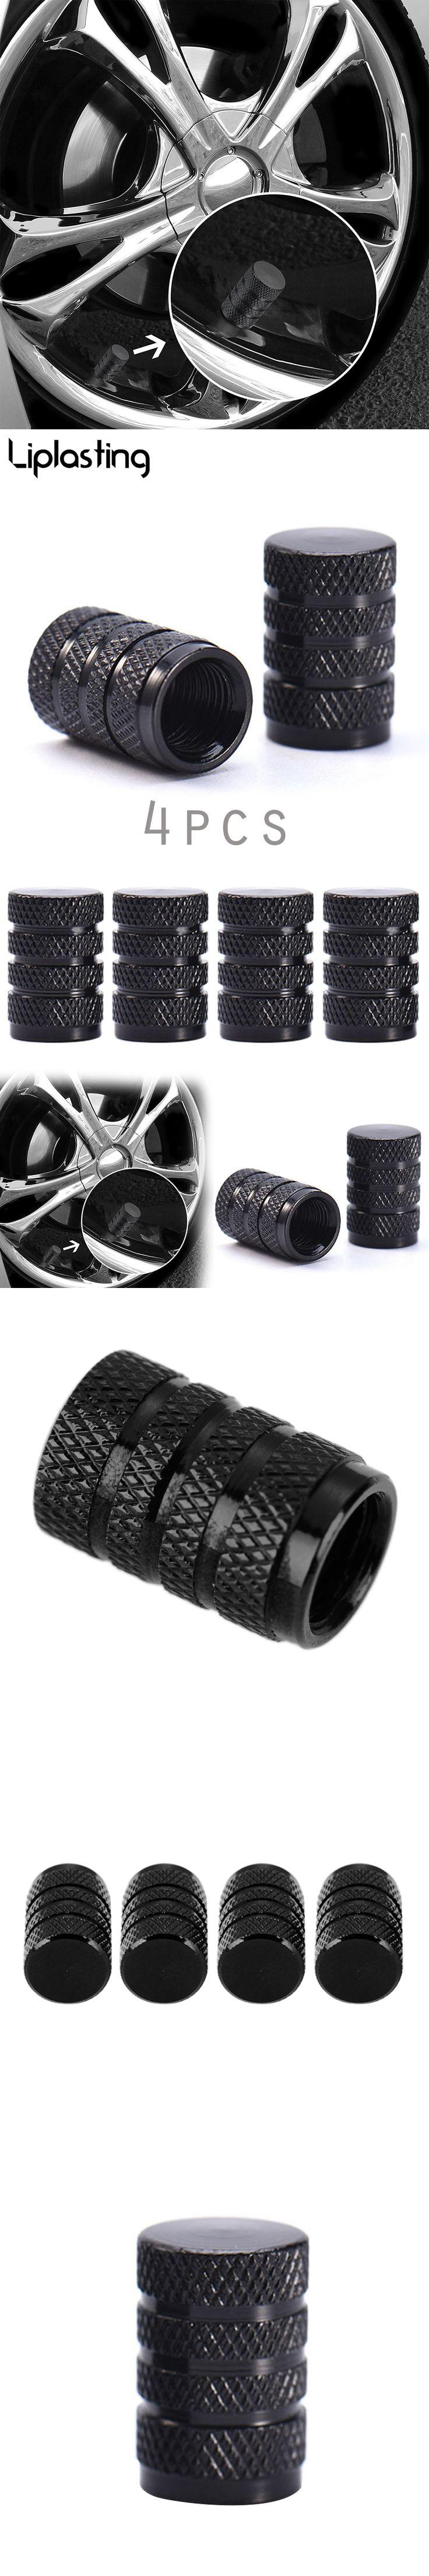 Liplasting USA 4PCs Black Durable Aluminium Alloy Dust Cover Wheel Tire Tyre Rim Valve Stem Caps Replacement for Car Truck